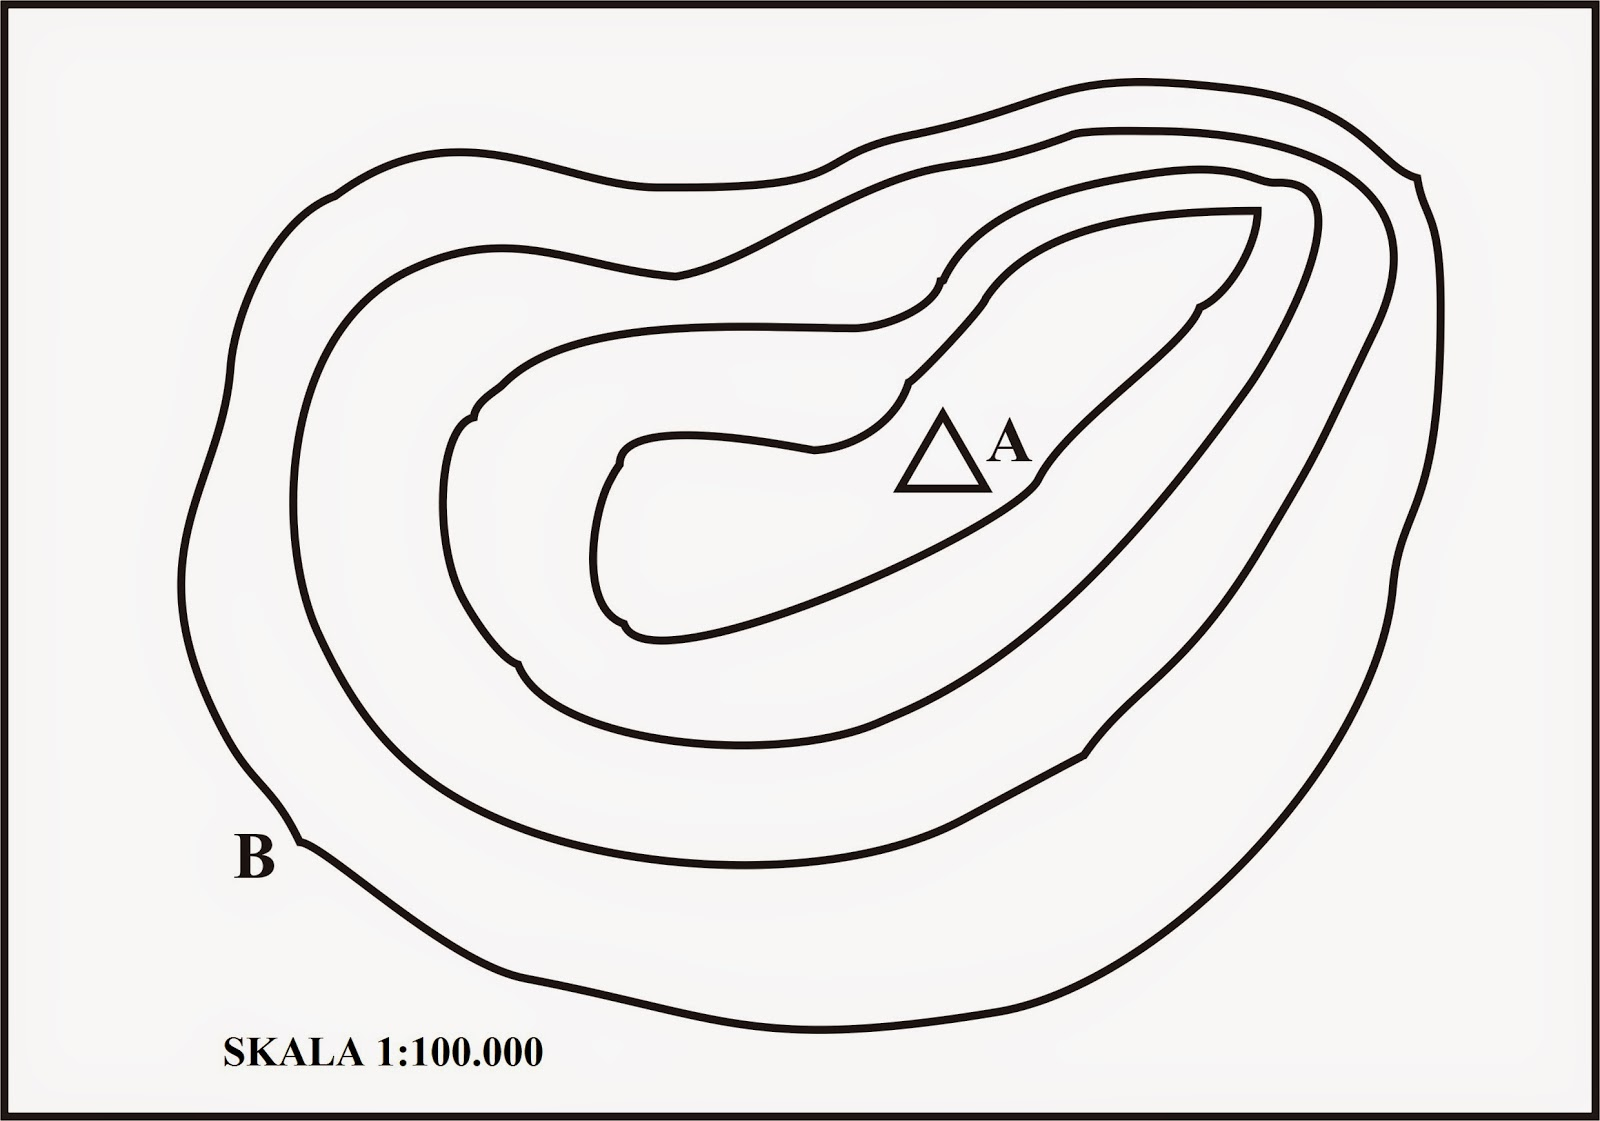 Contoh Soal Geografi Teknik Uraian - Katalog Geografi